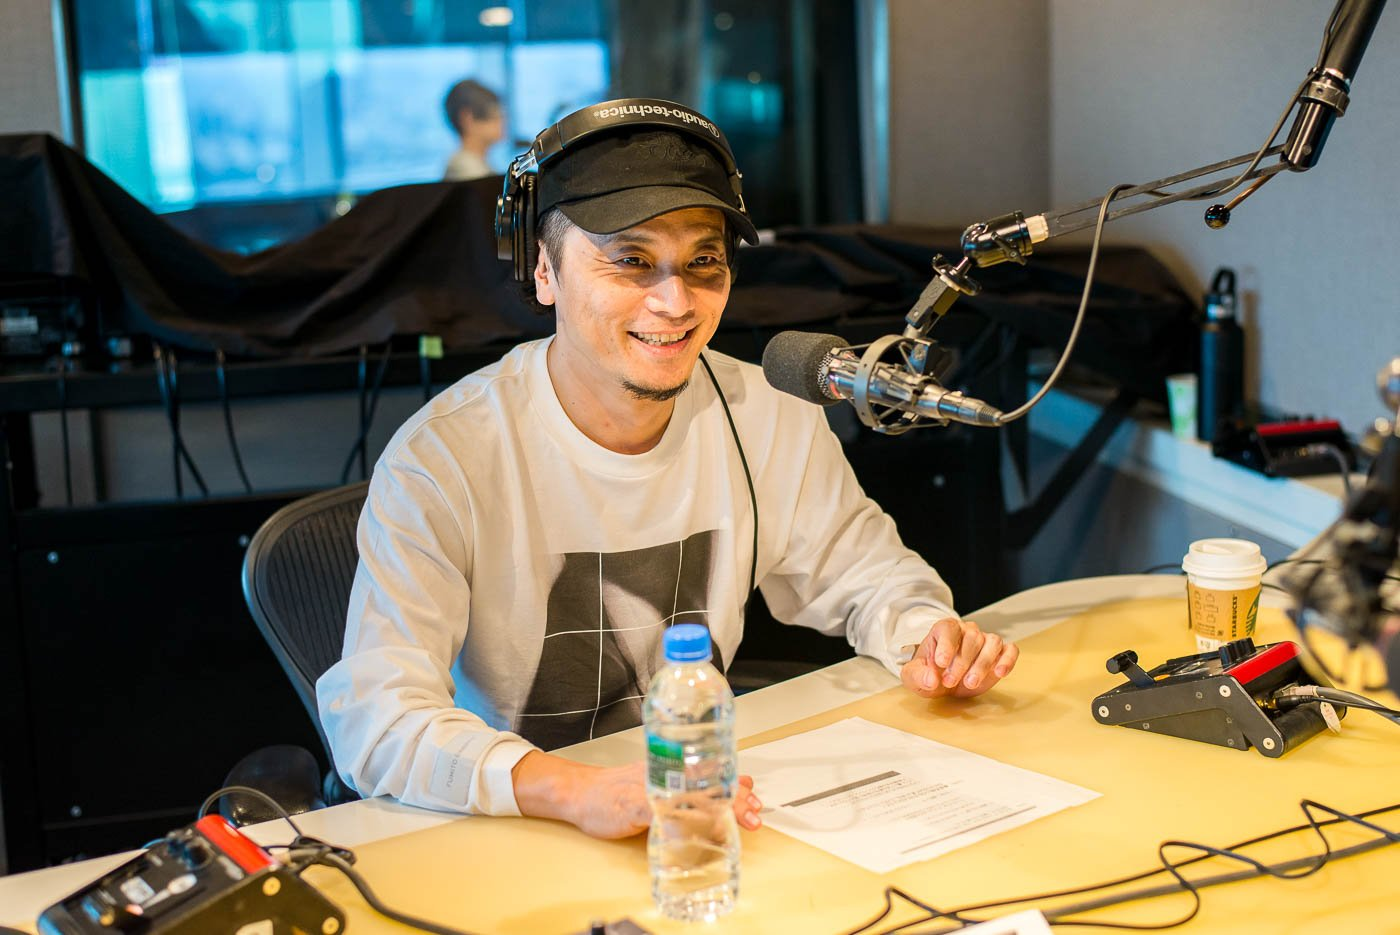 KREVA、新作『AFTERMIXTAPE』は「心のままに曲を作れた」